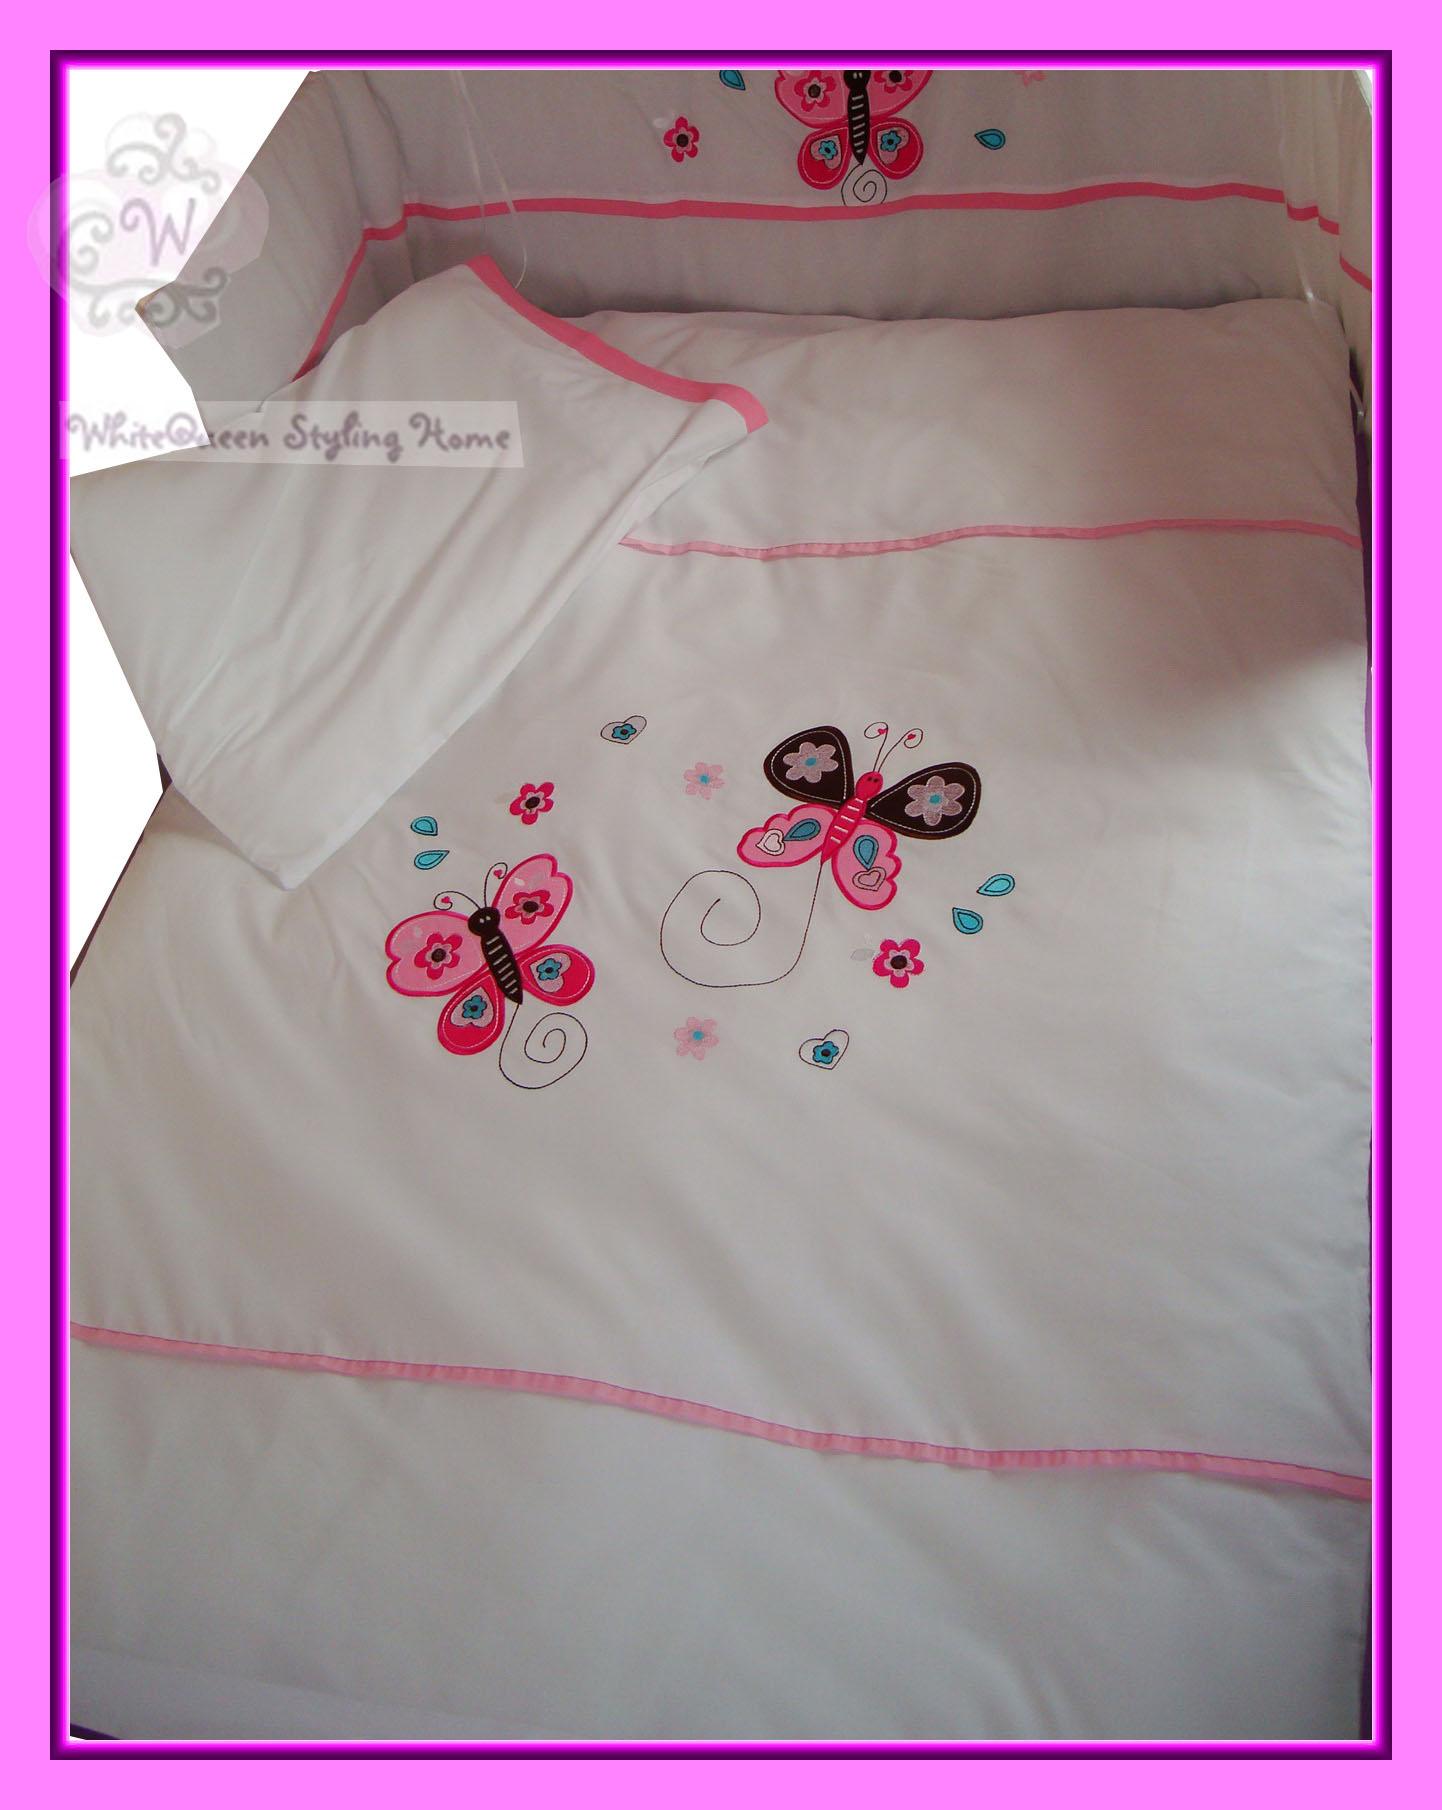 baby bettw sche set schmetterlinge blumen herzen rosa butterfly duvet cover ebay. Black Bedroom Furniture Sets. Home Design Ideas